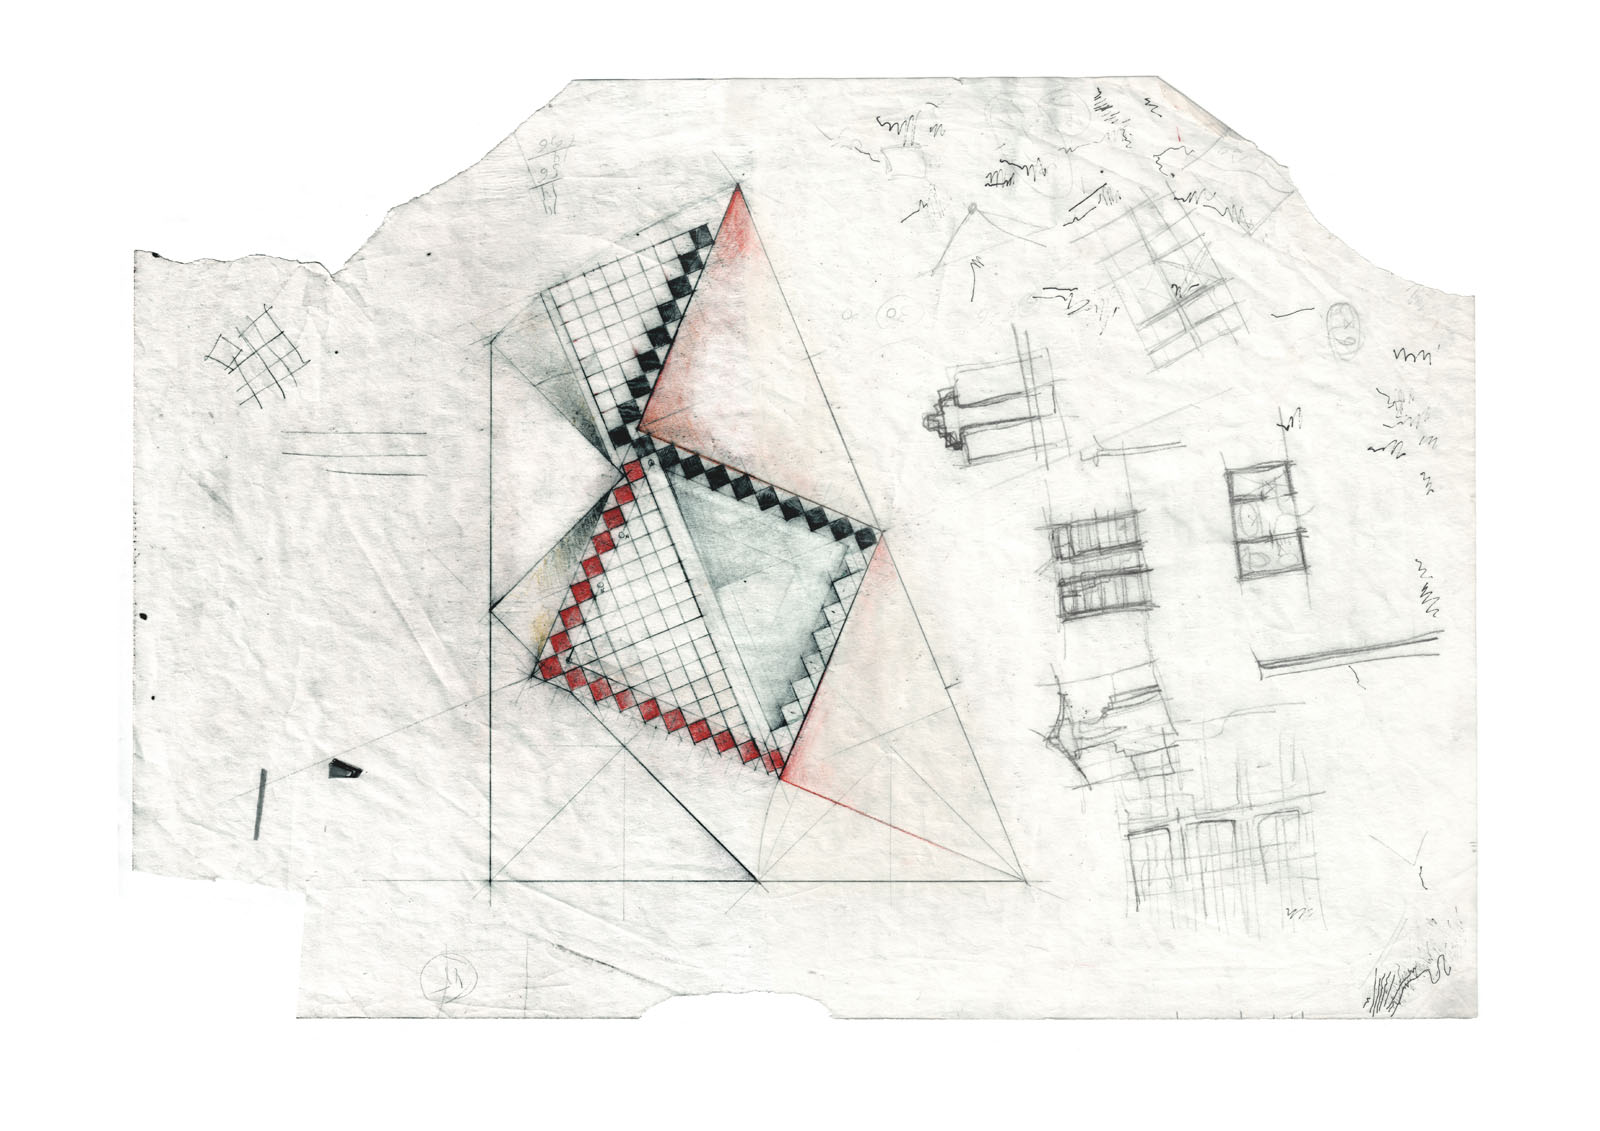 danielvillalobos-architecturexxthcentury-spanisharchitecture-schoolarchitectureproject-11